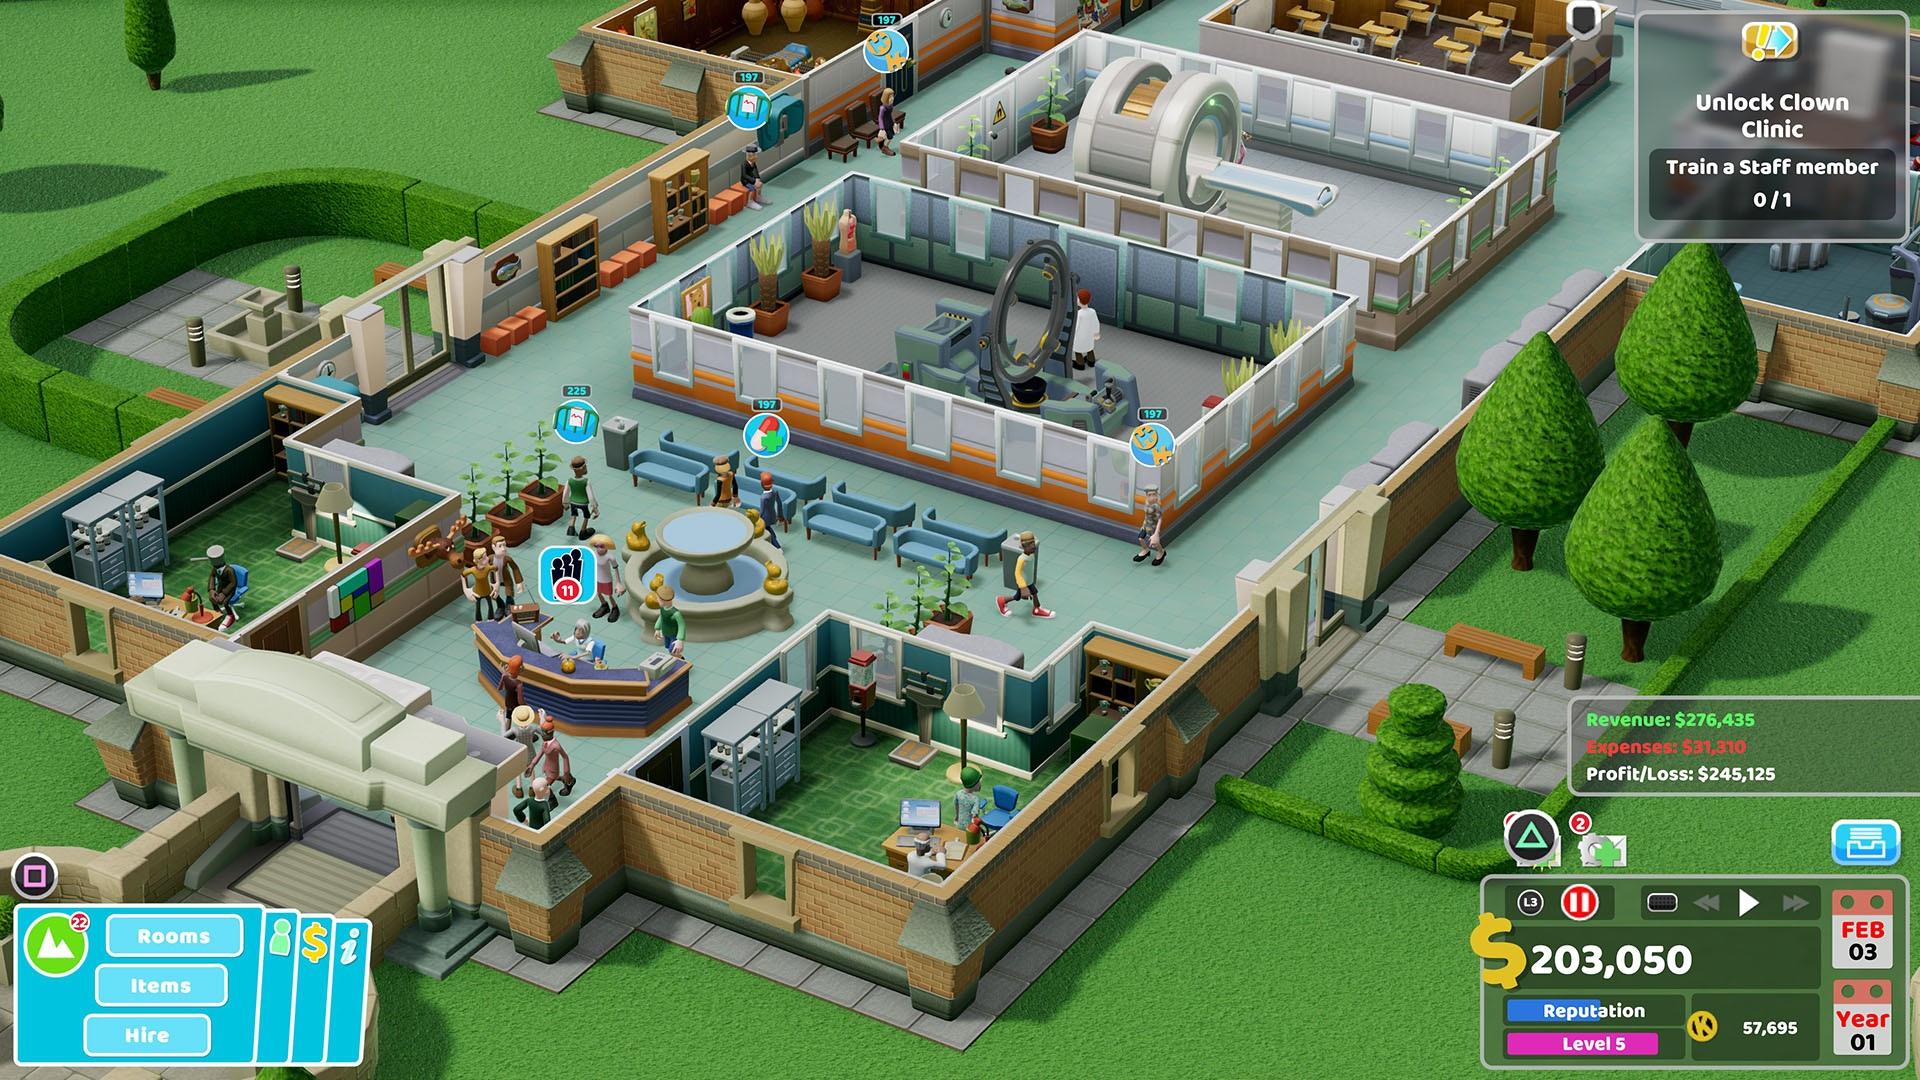 Бизнес-план: Обзор Two Point Hospital